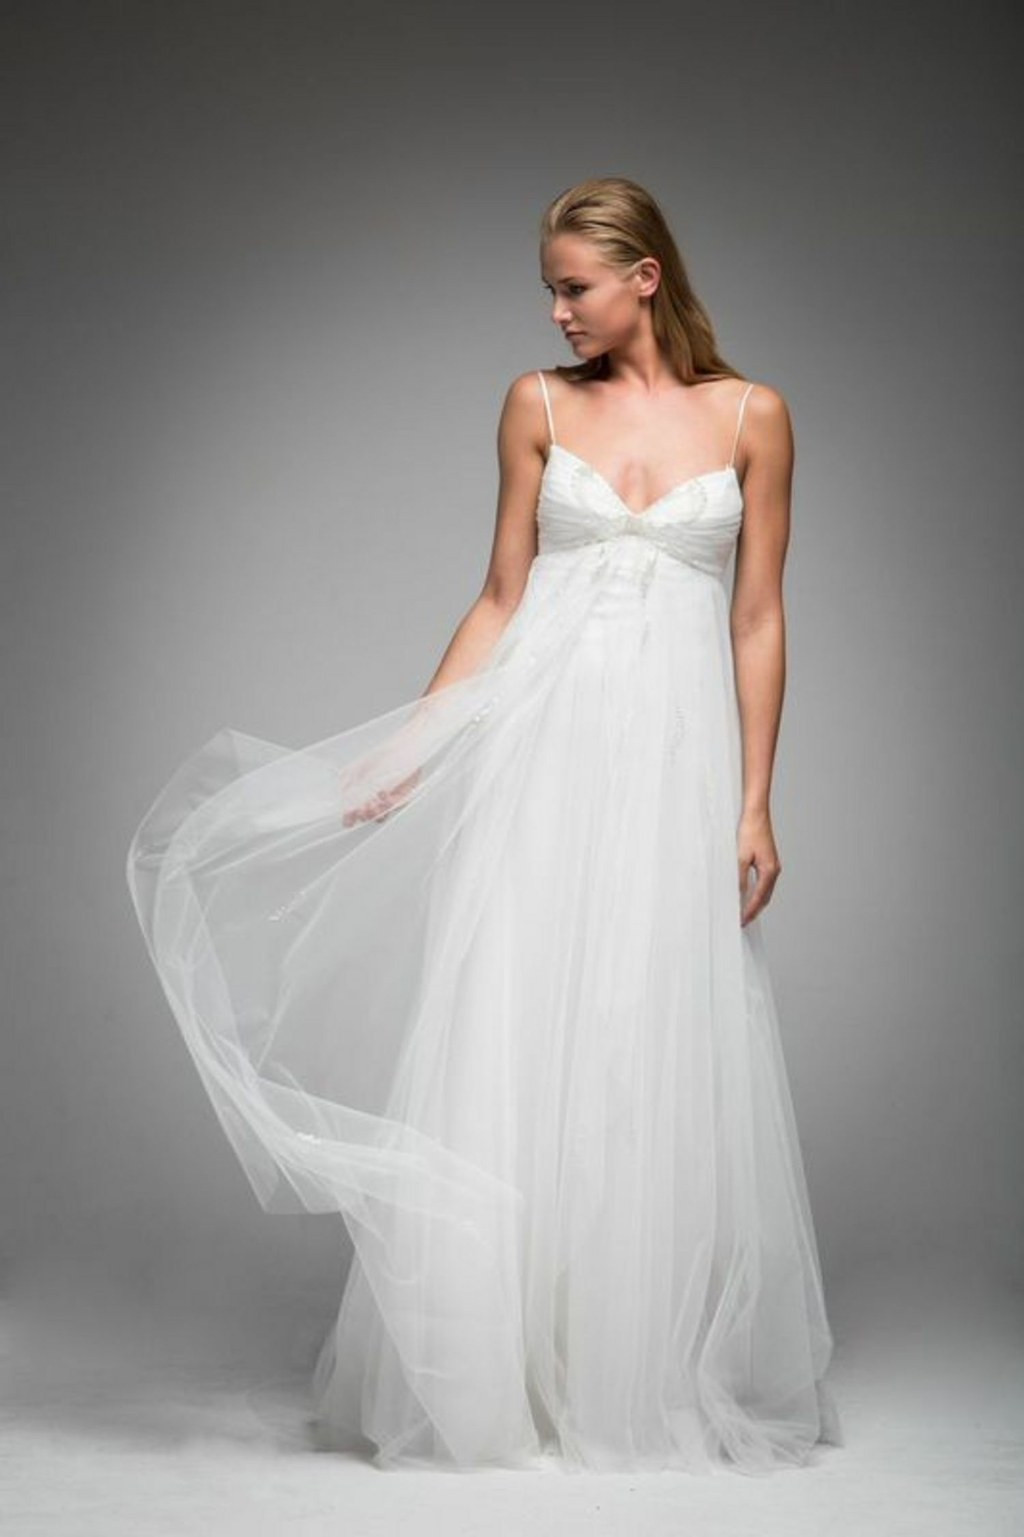 Spaghetti Strap Wedding Dresses  Spaghetti Strap Wedding Dresses New Spaghetti Strap